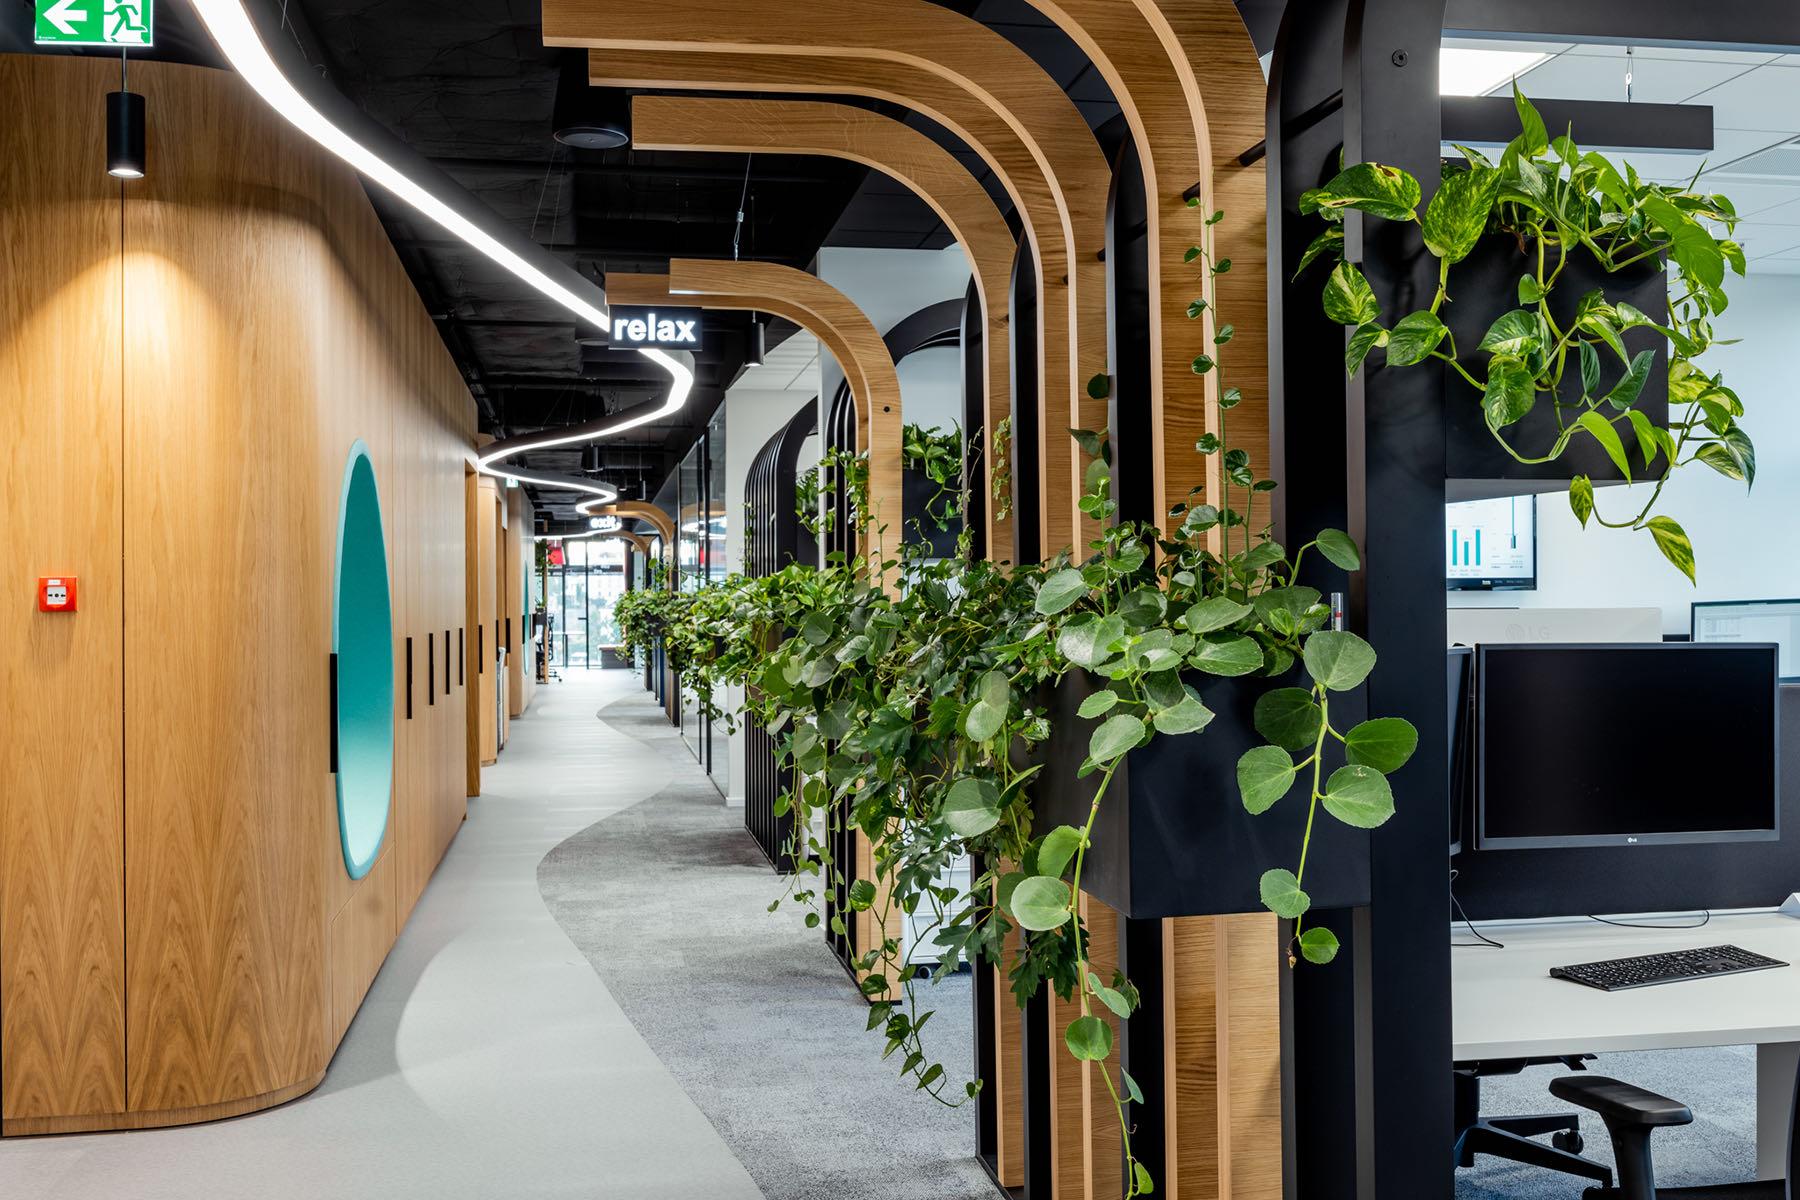 A Look Inside PKV's New Brno Office